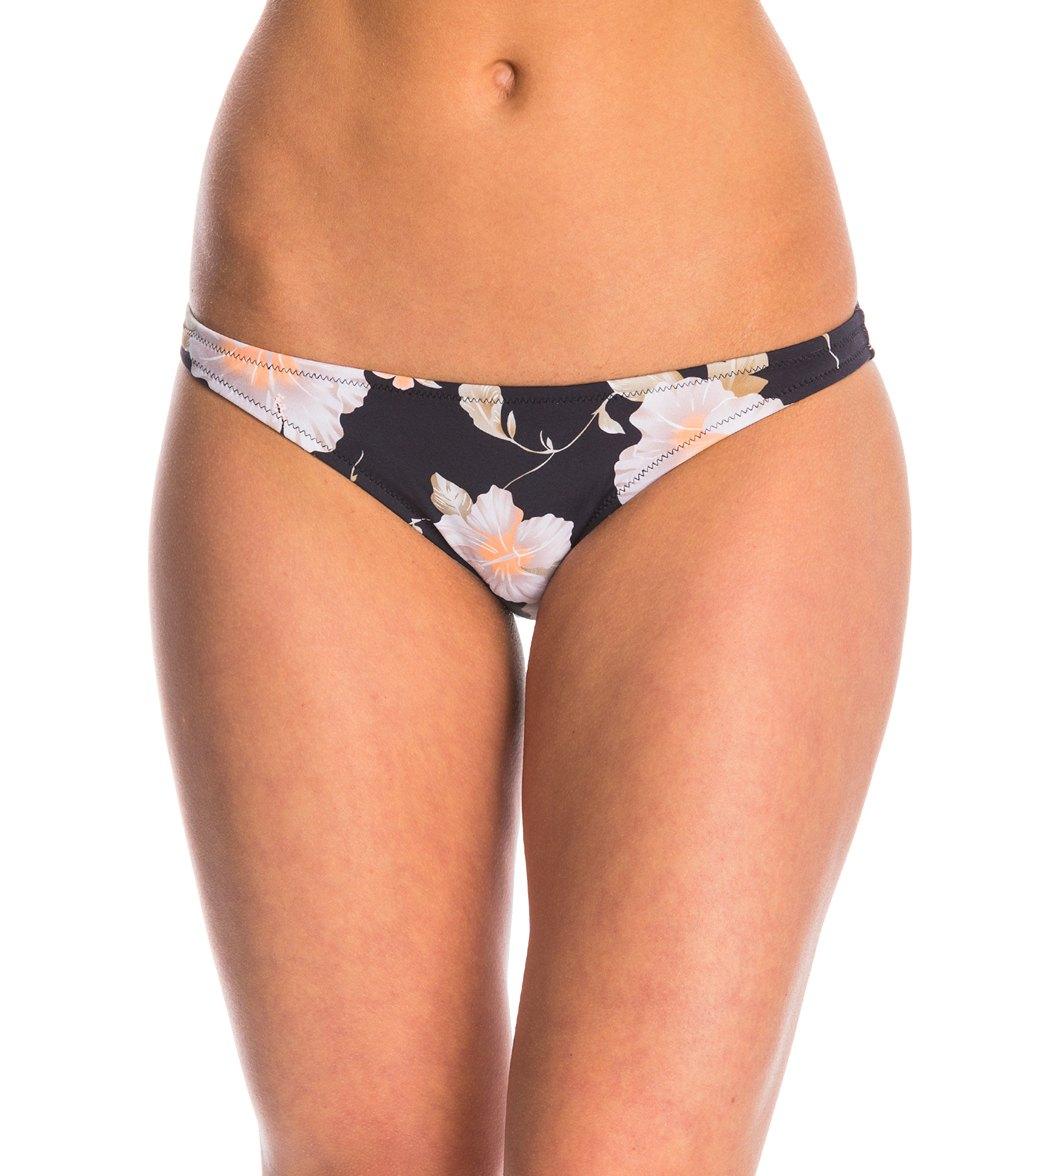 Beach bikini bottom pics 88